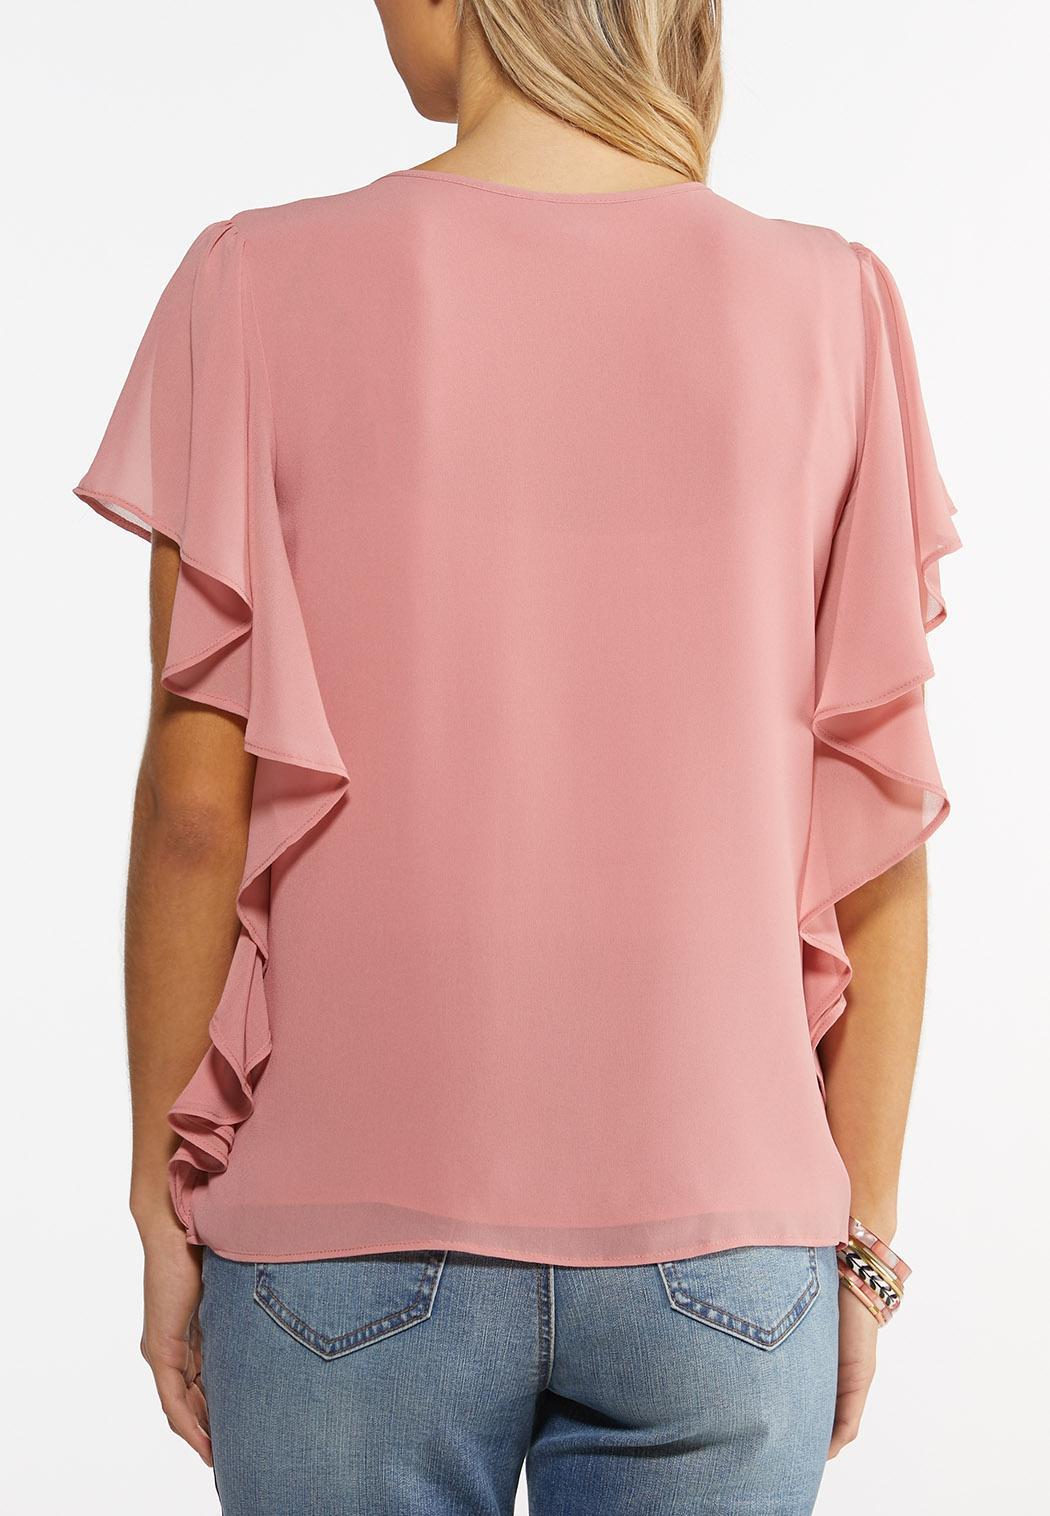 Plus Size Flutter Sleeve Top (Item #44516651)